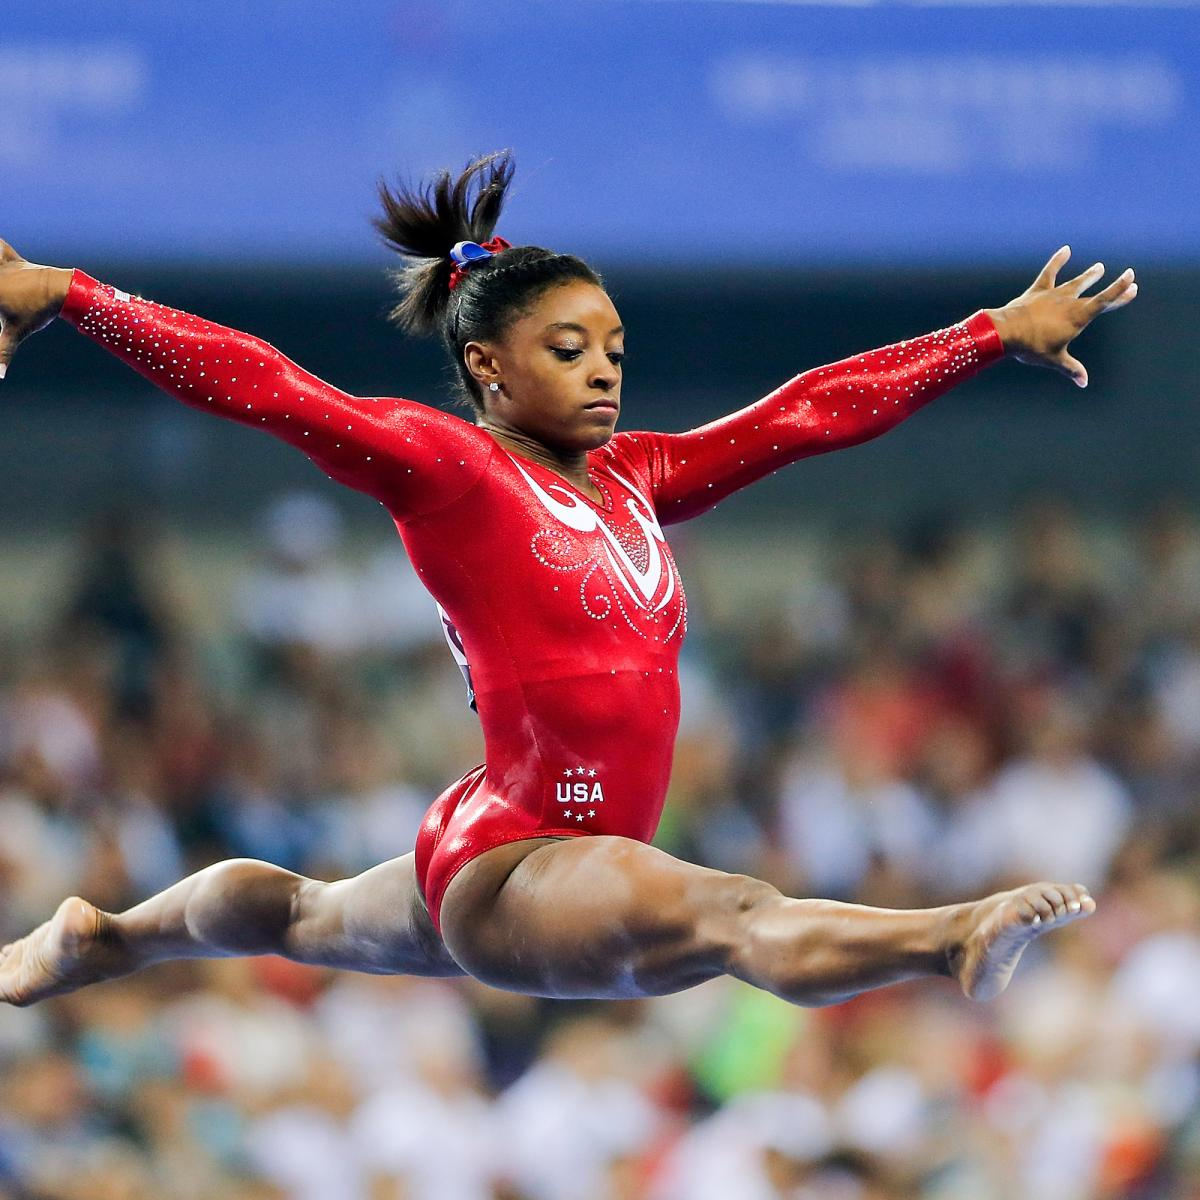 Spectacular photos show gymnasts gravity-defying skills